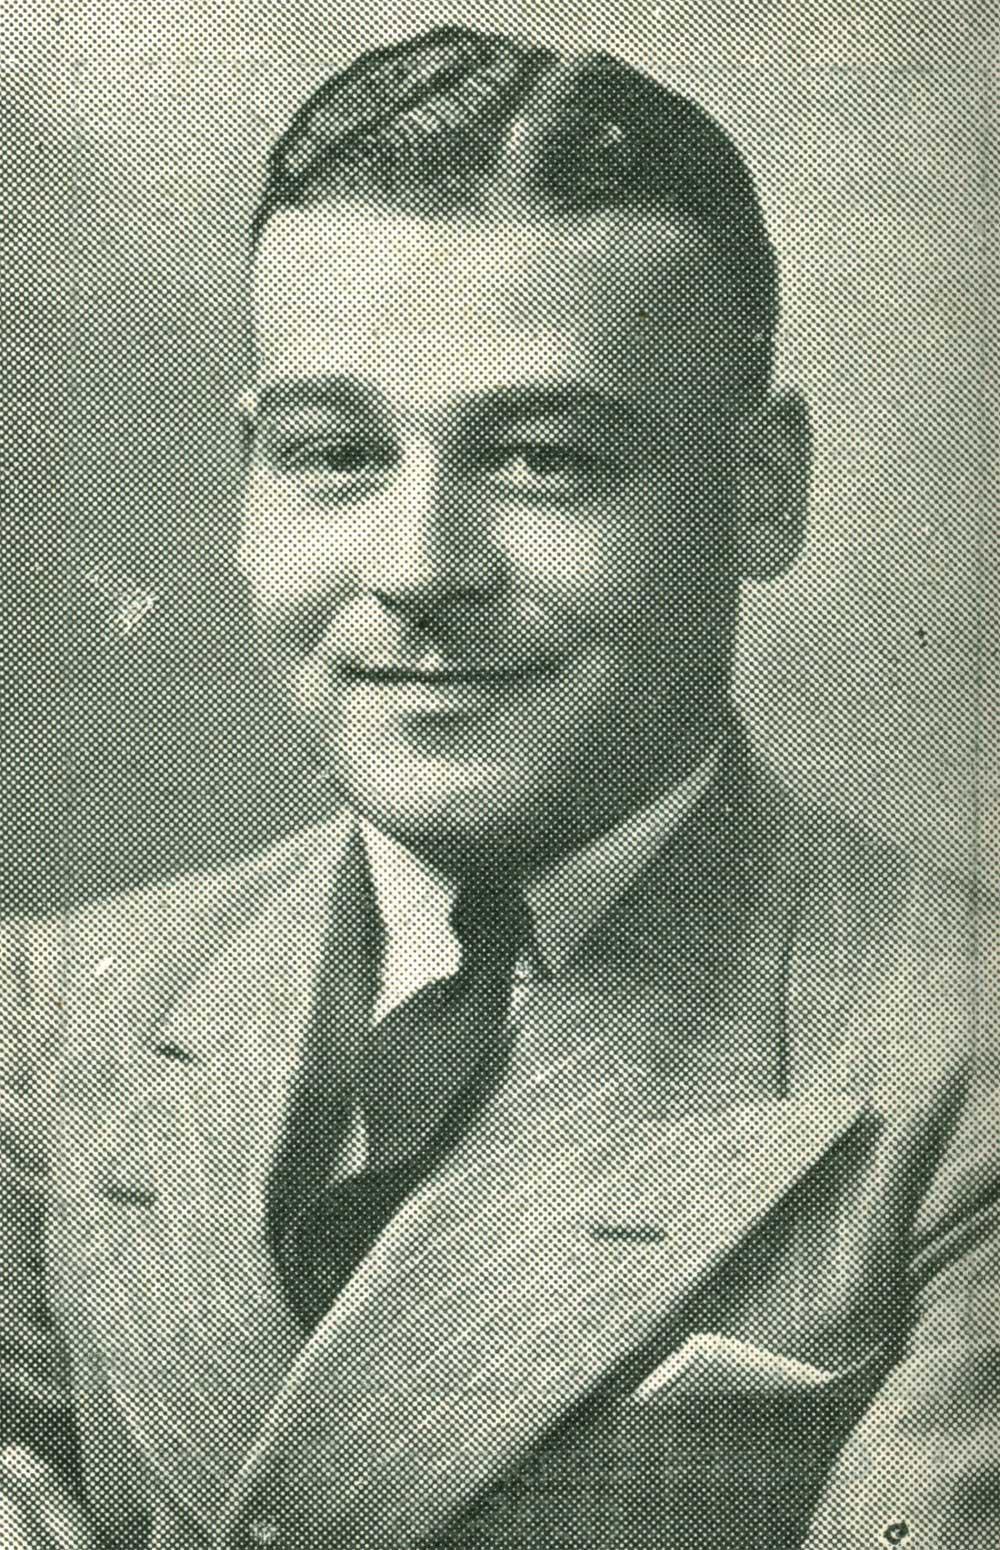 1941_07_16_dvorjetz_george.jpg